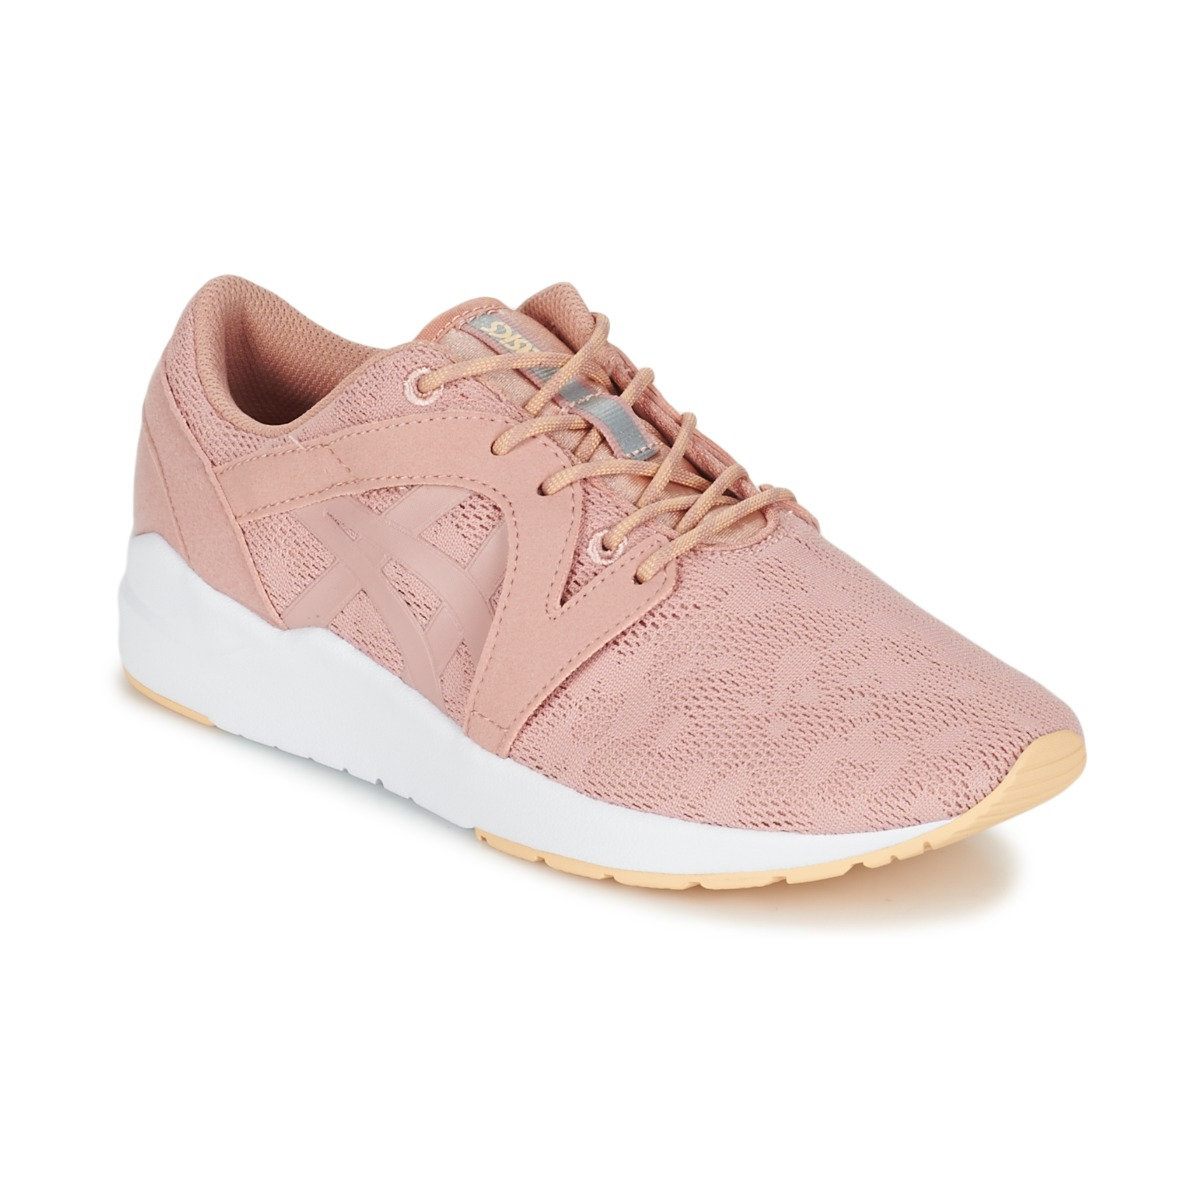 Asics GEL-LYTE KOMACHI W Rose - Kostenloser Versand bei Spartoode ! - Schuhe Sneaker Low Damen 67,99 €